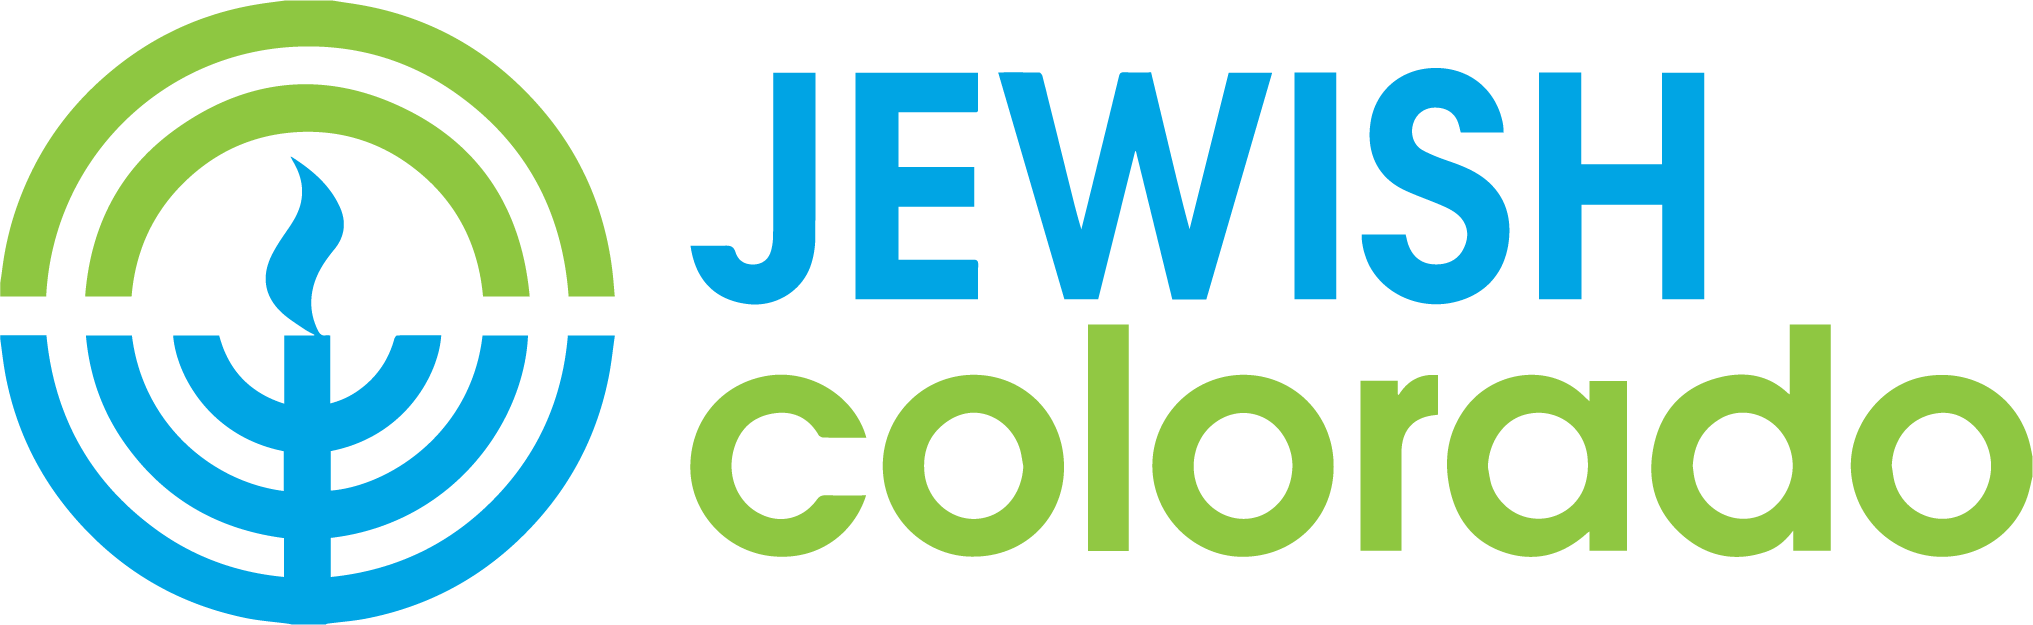 JEWISHcolorado_Stacked